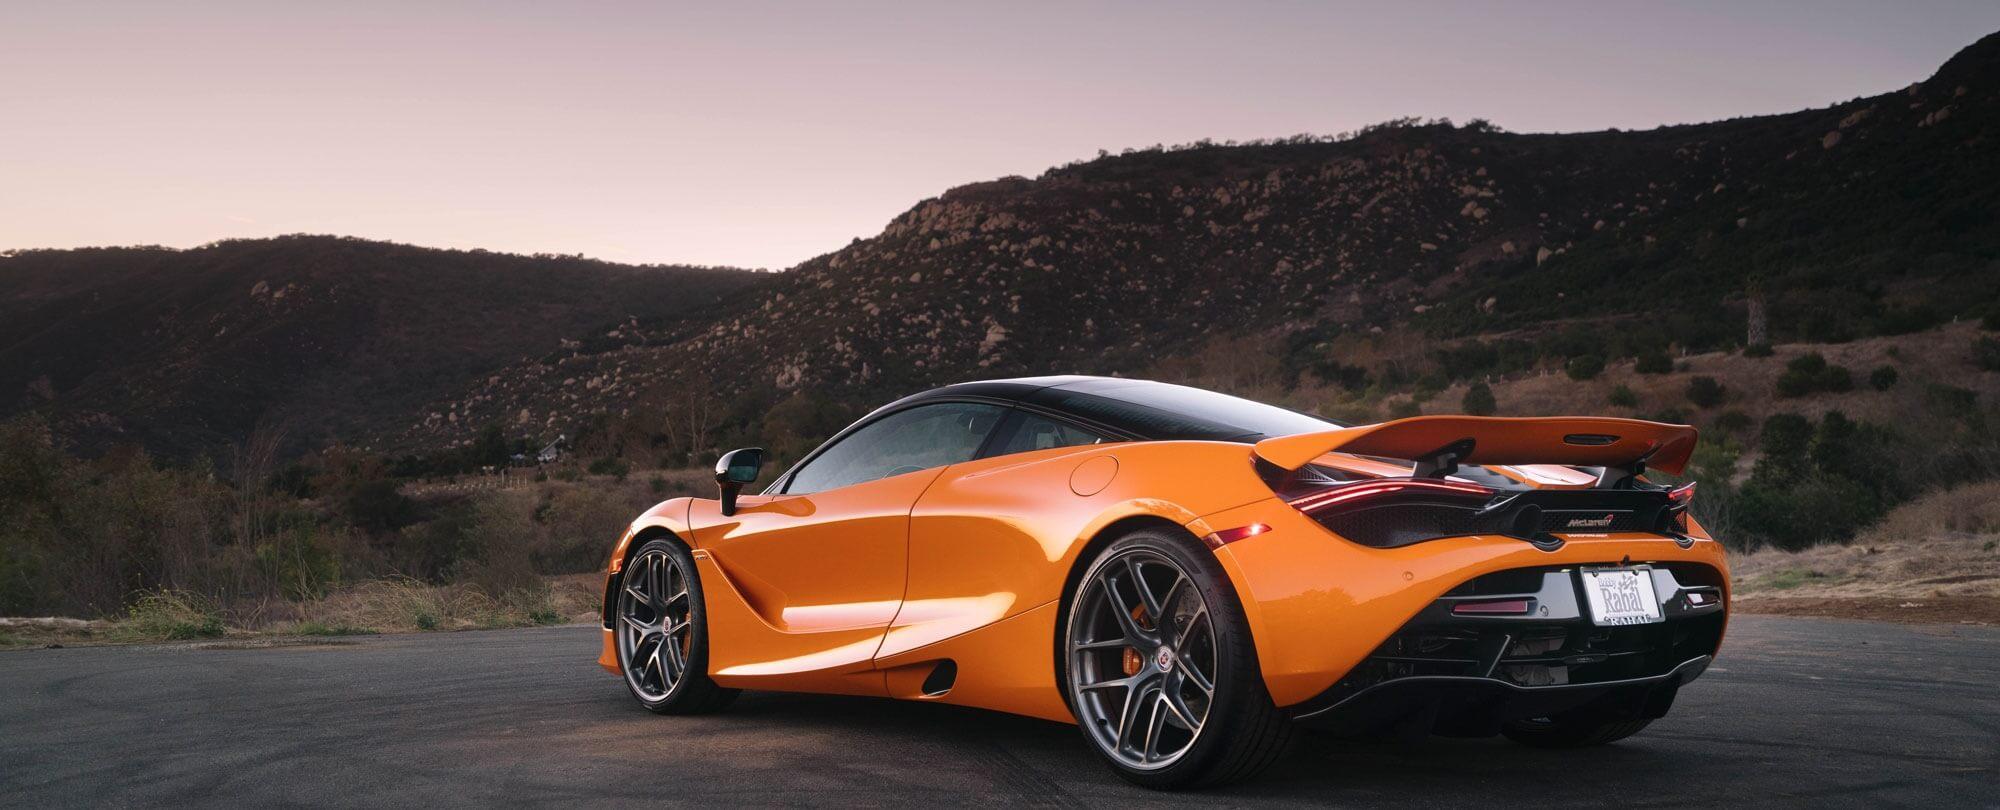 The Worlds Best Custom Forged Wheels For Motorsport Performance - Best bmw wheels